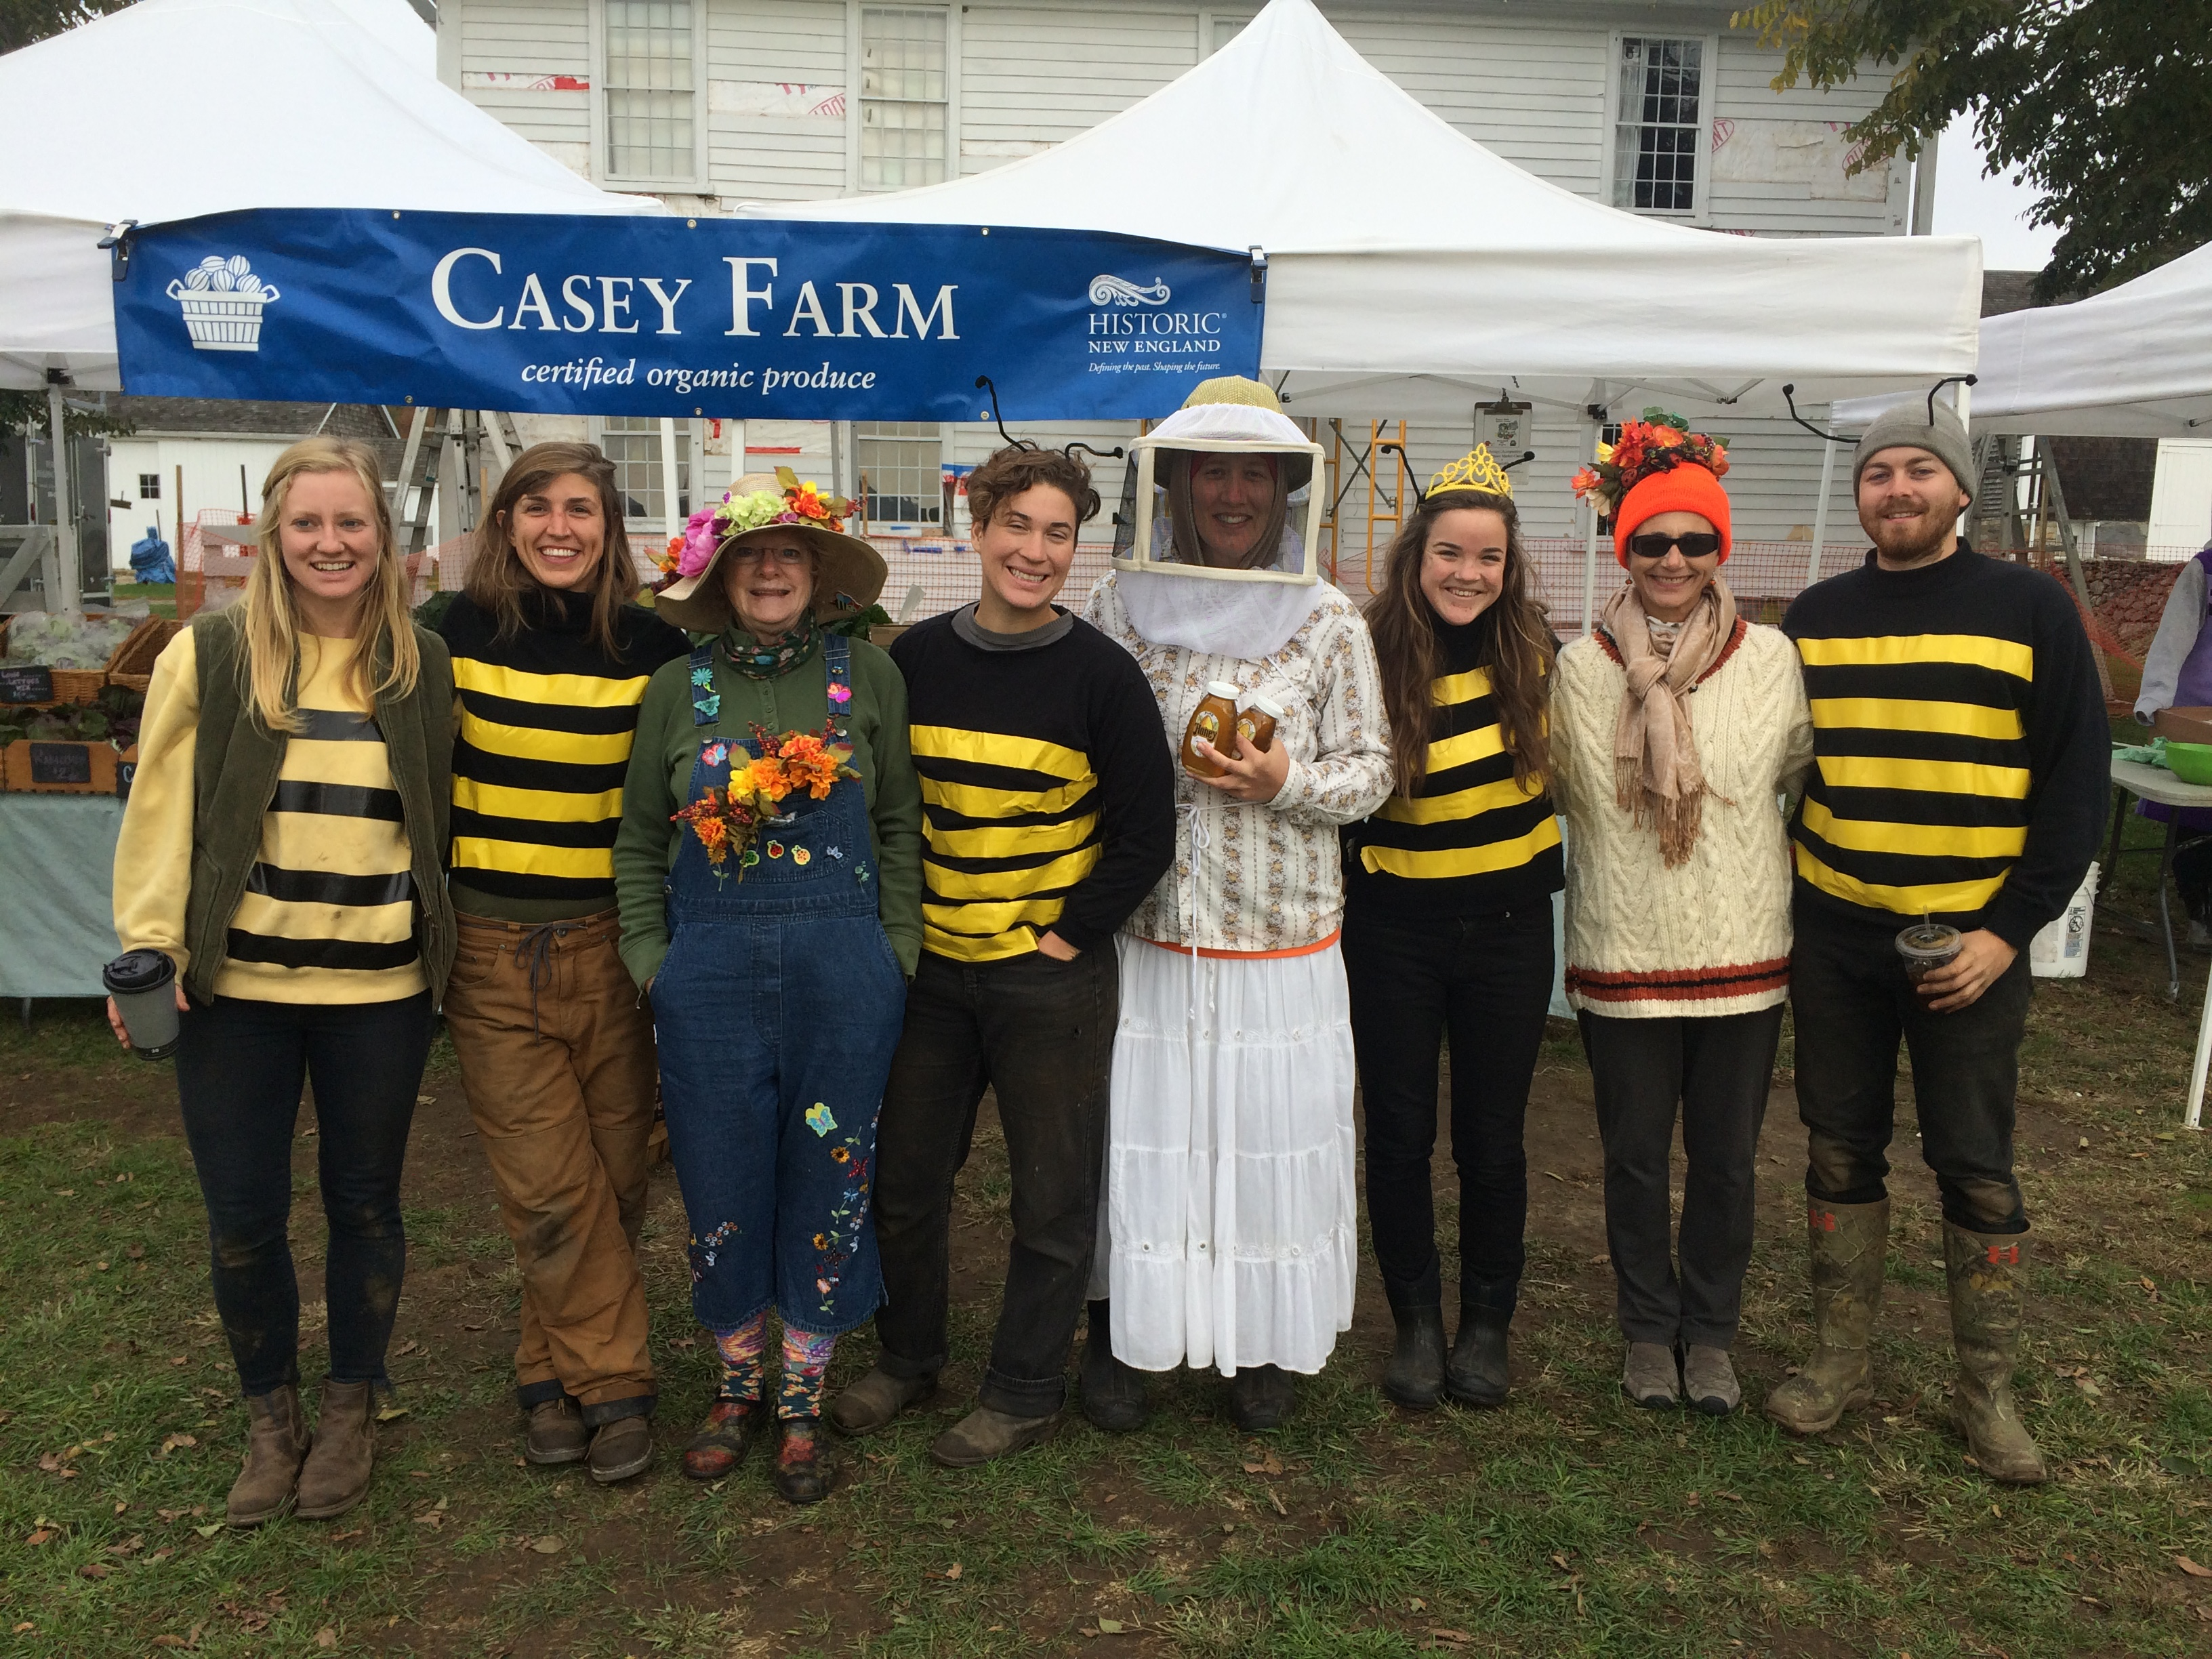 10-29-16-halloween-casey-farm